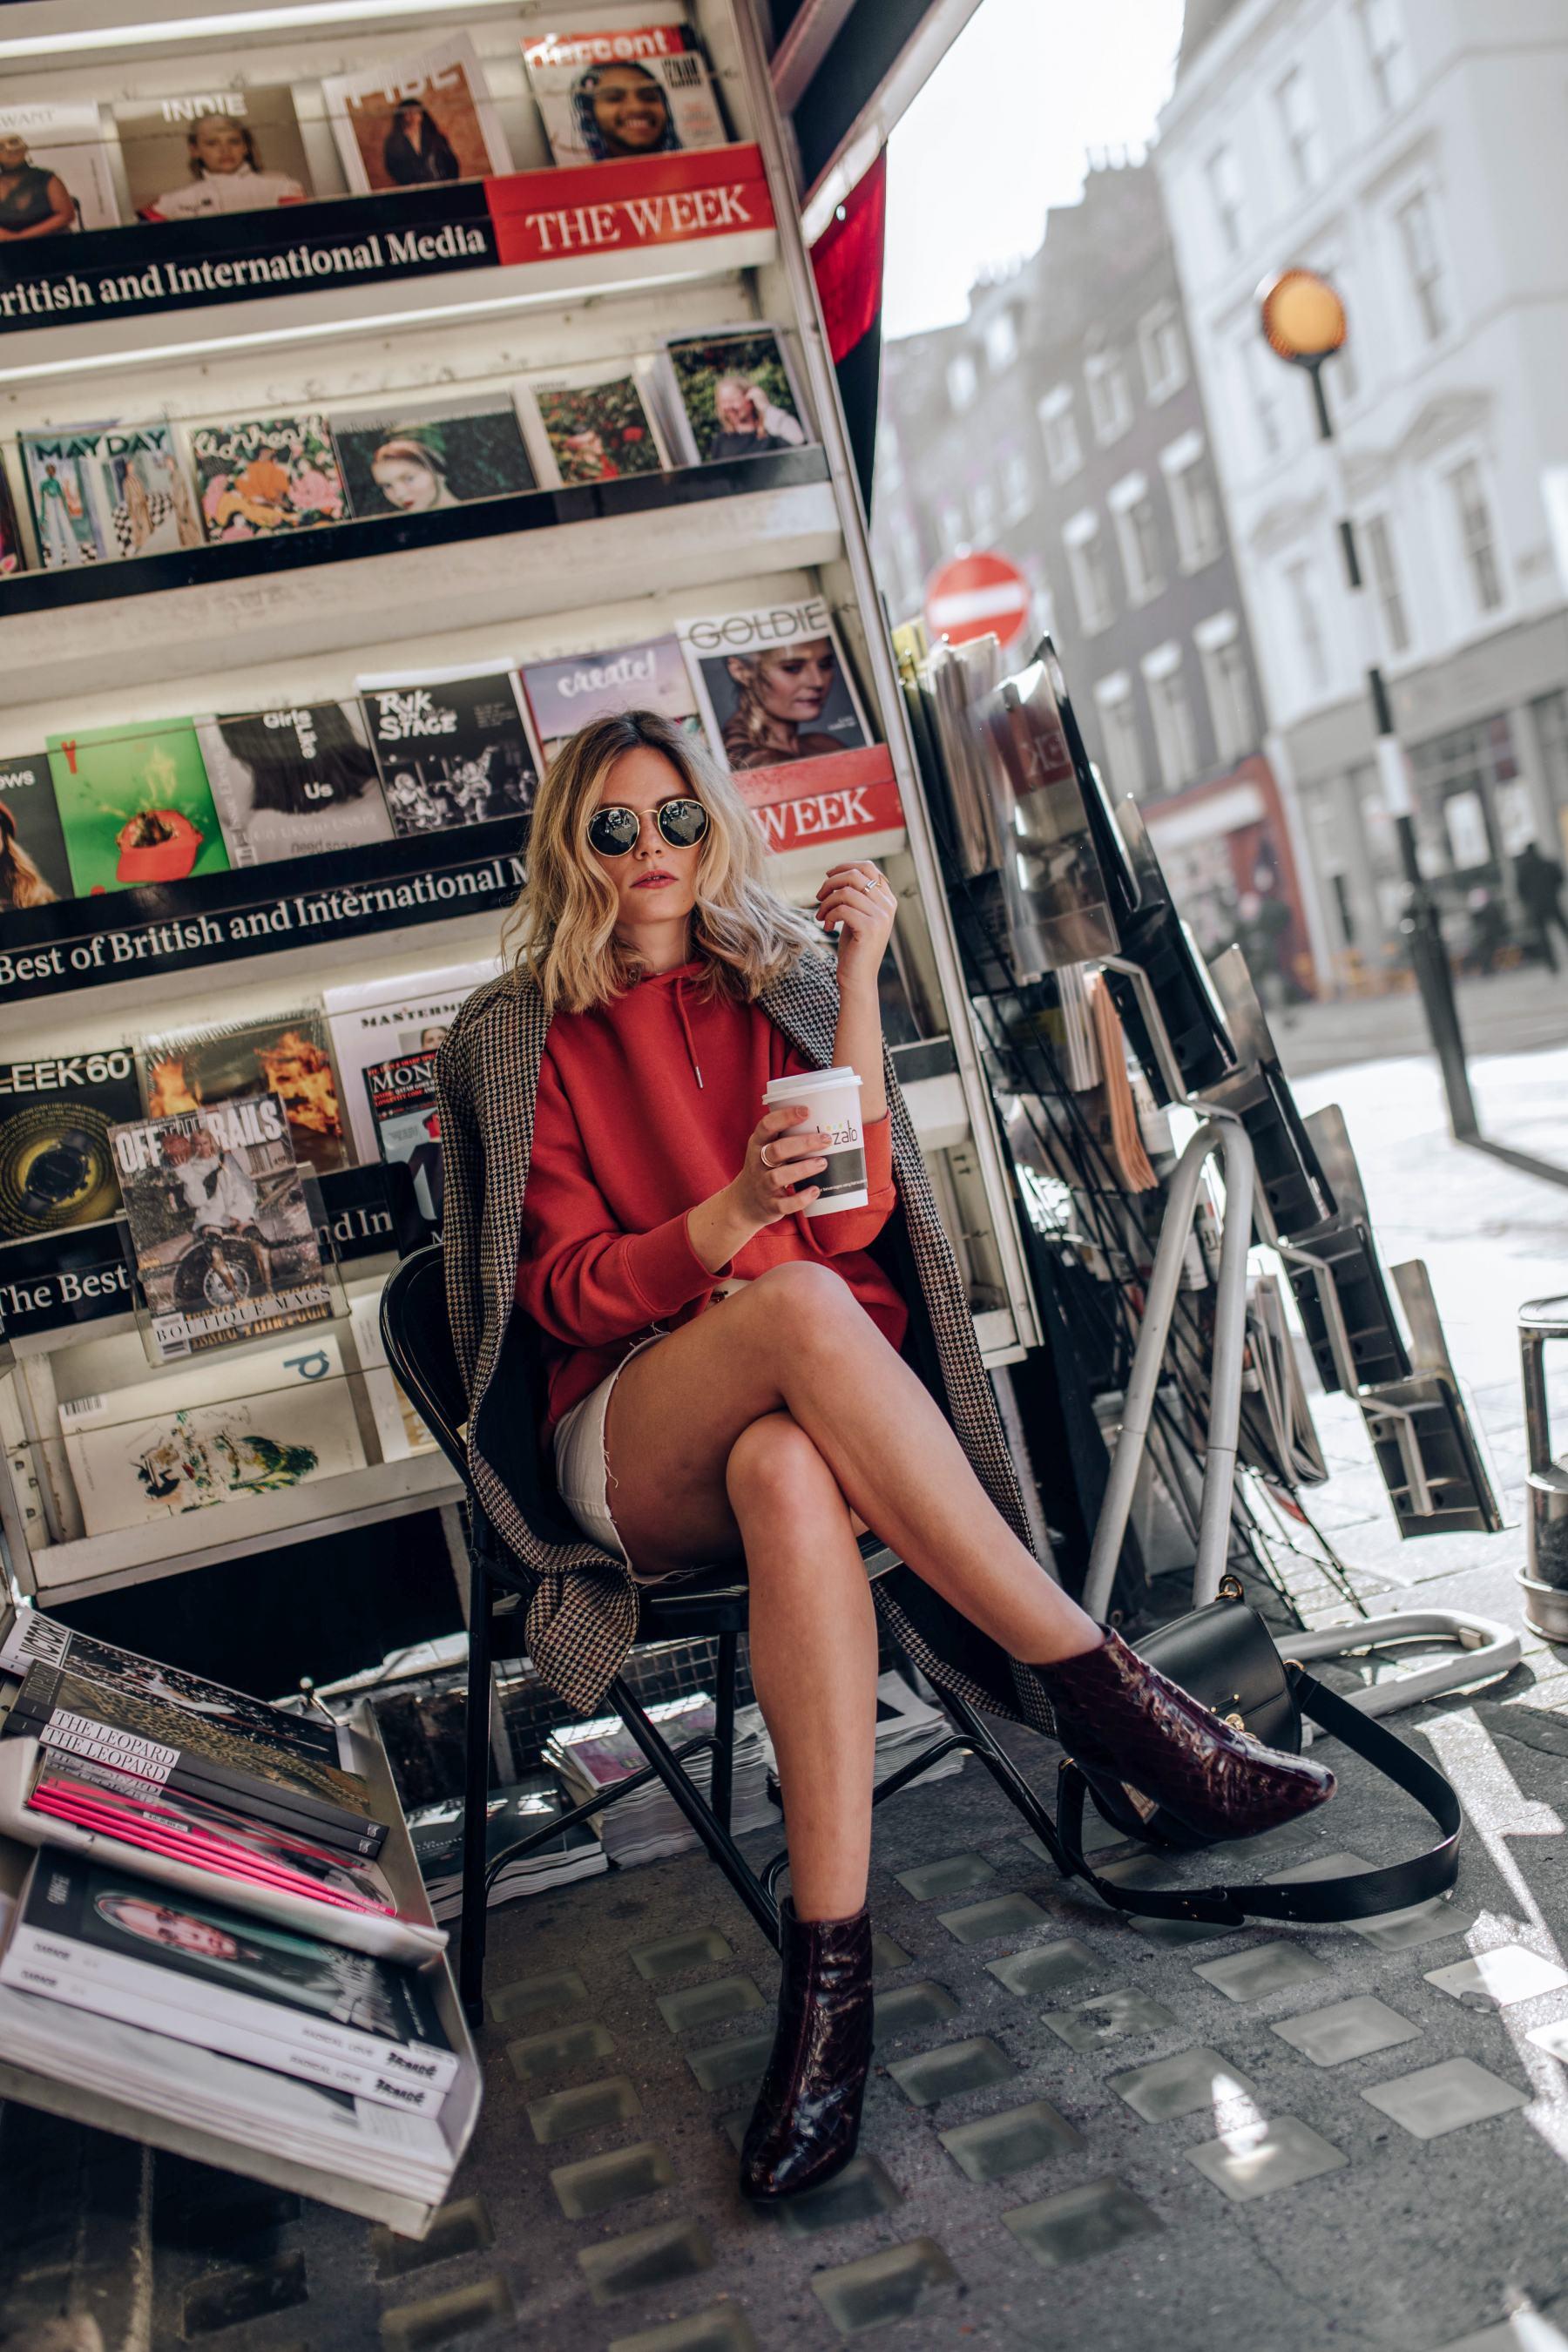 c56b6010be23 style fashion london street style topshop asos jesschamilton cocoachelsea  outfit inspiration ...